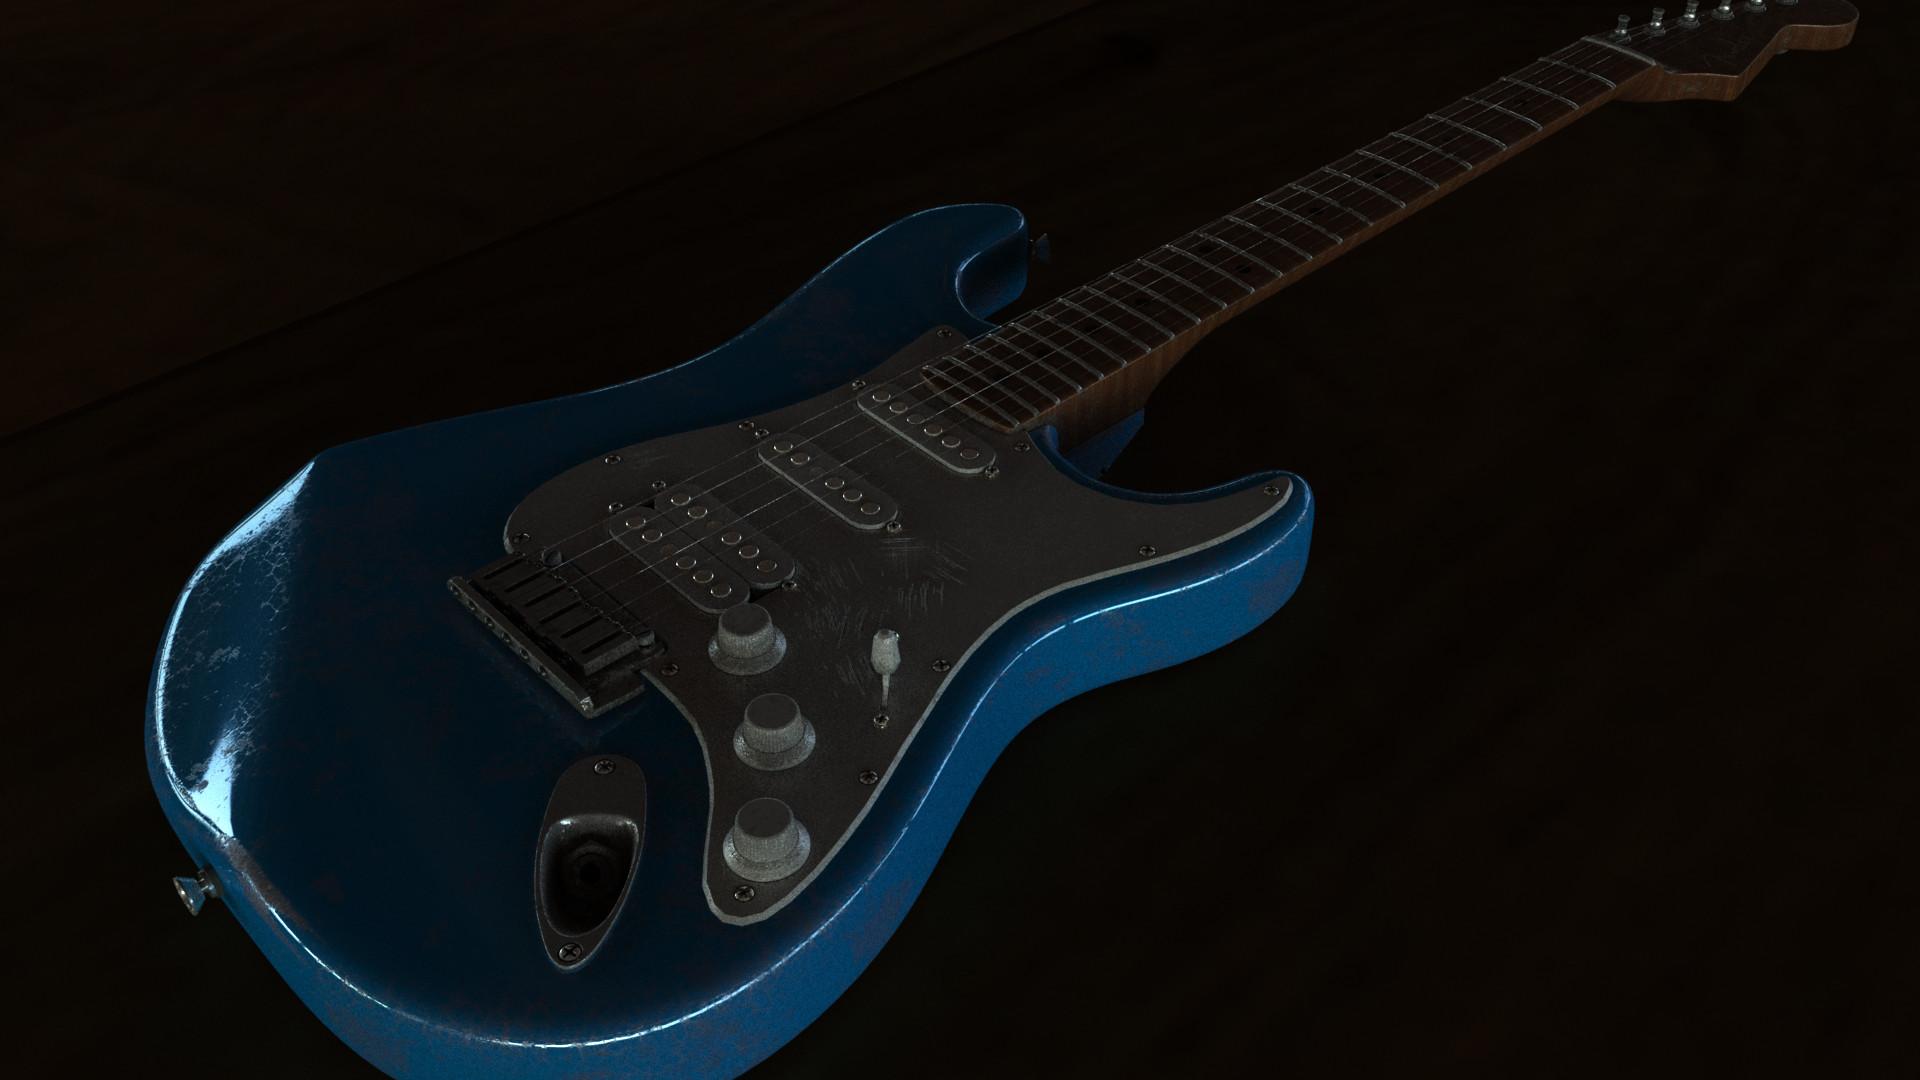 Sebastian gomez sebastians guitar renderman 0226 4th